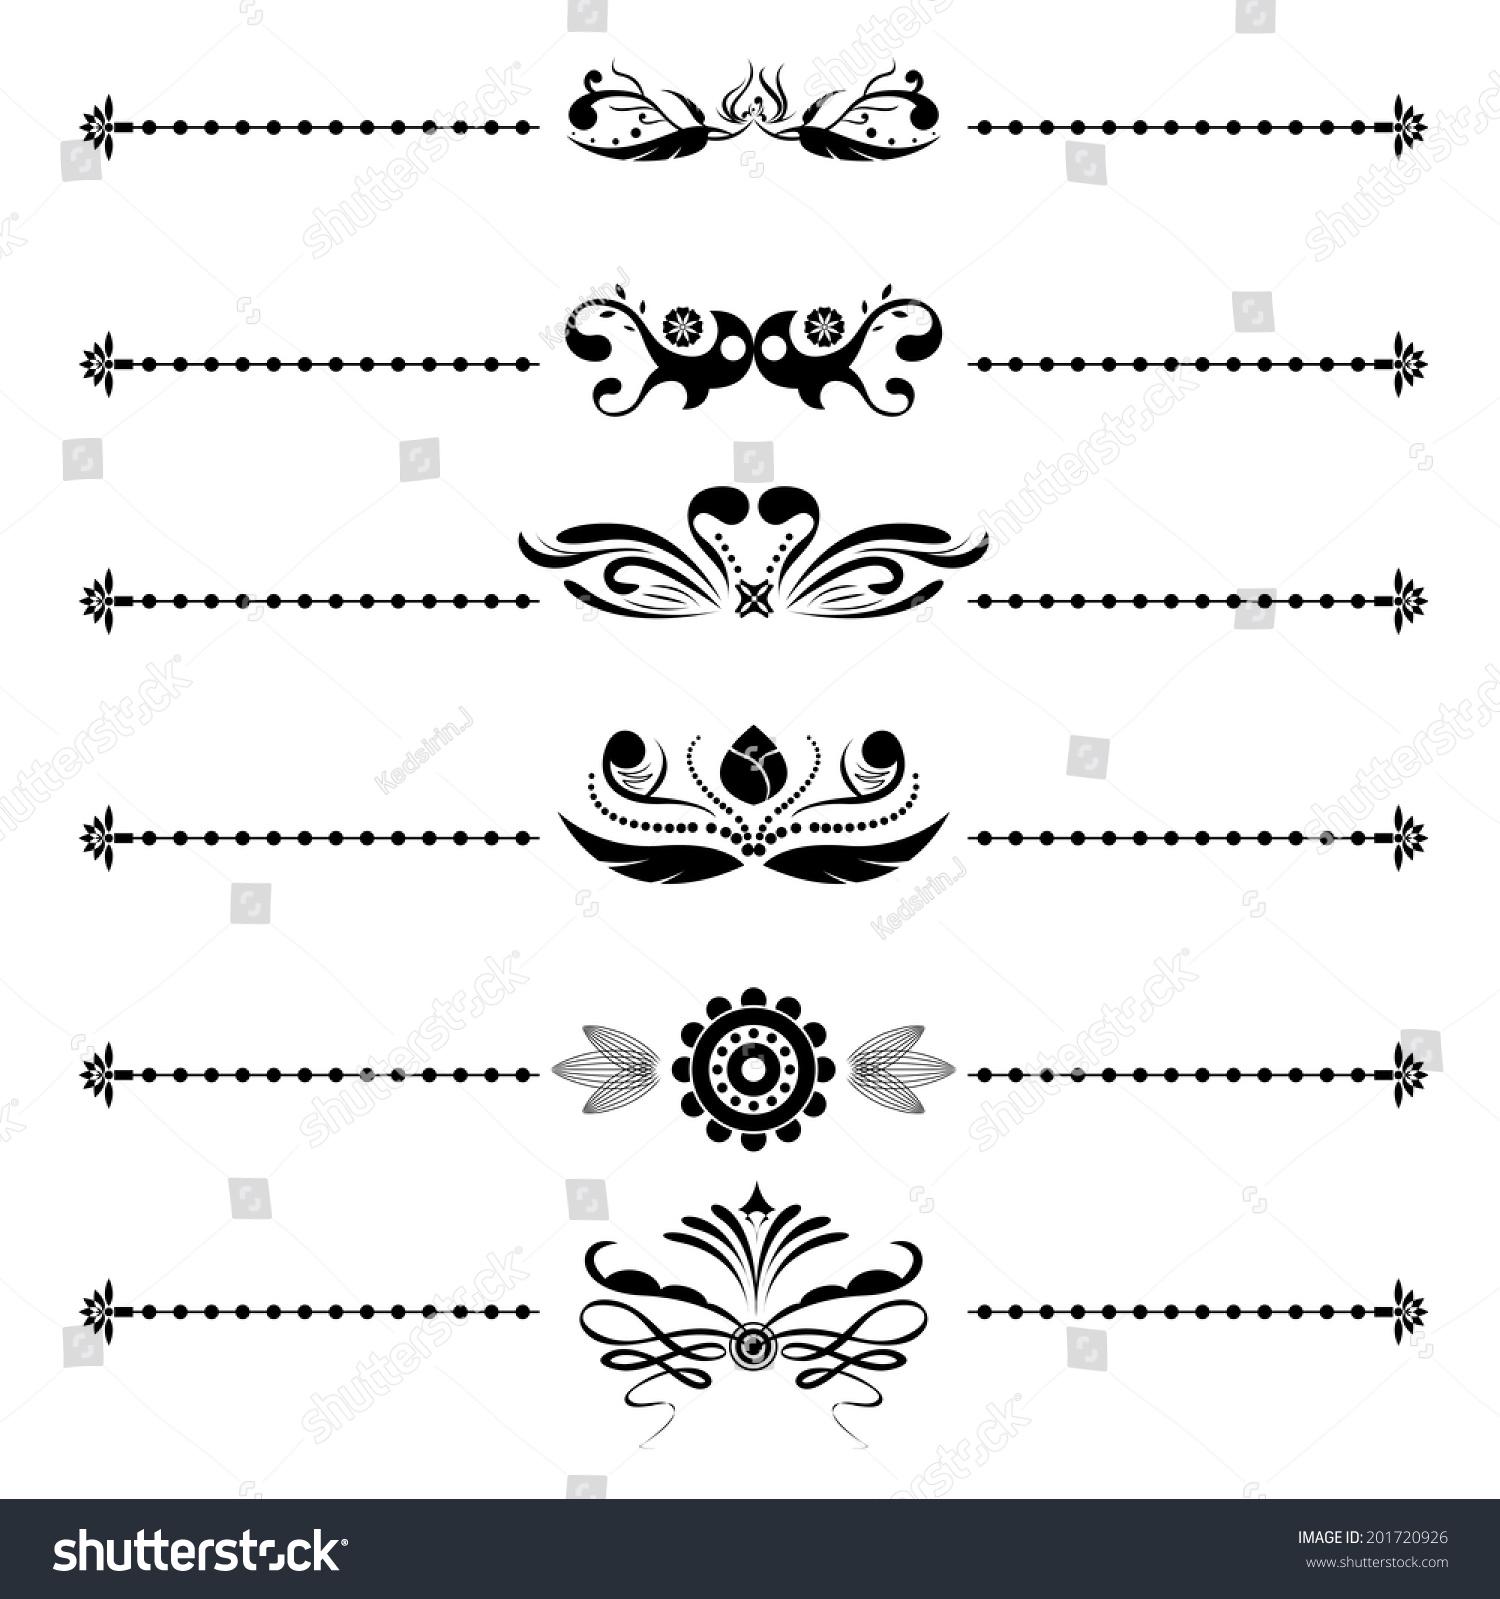 calligraphic vintage floral vector designs for wedding